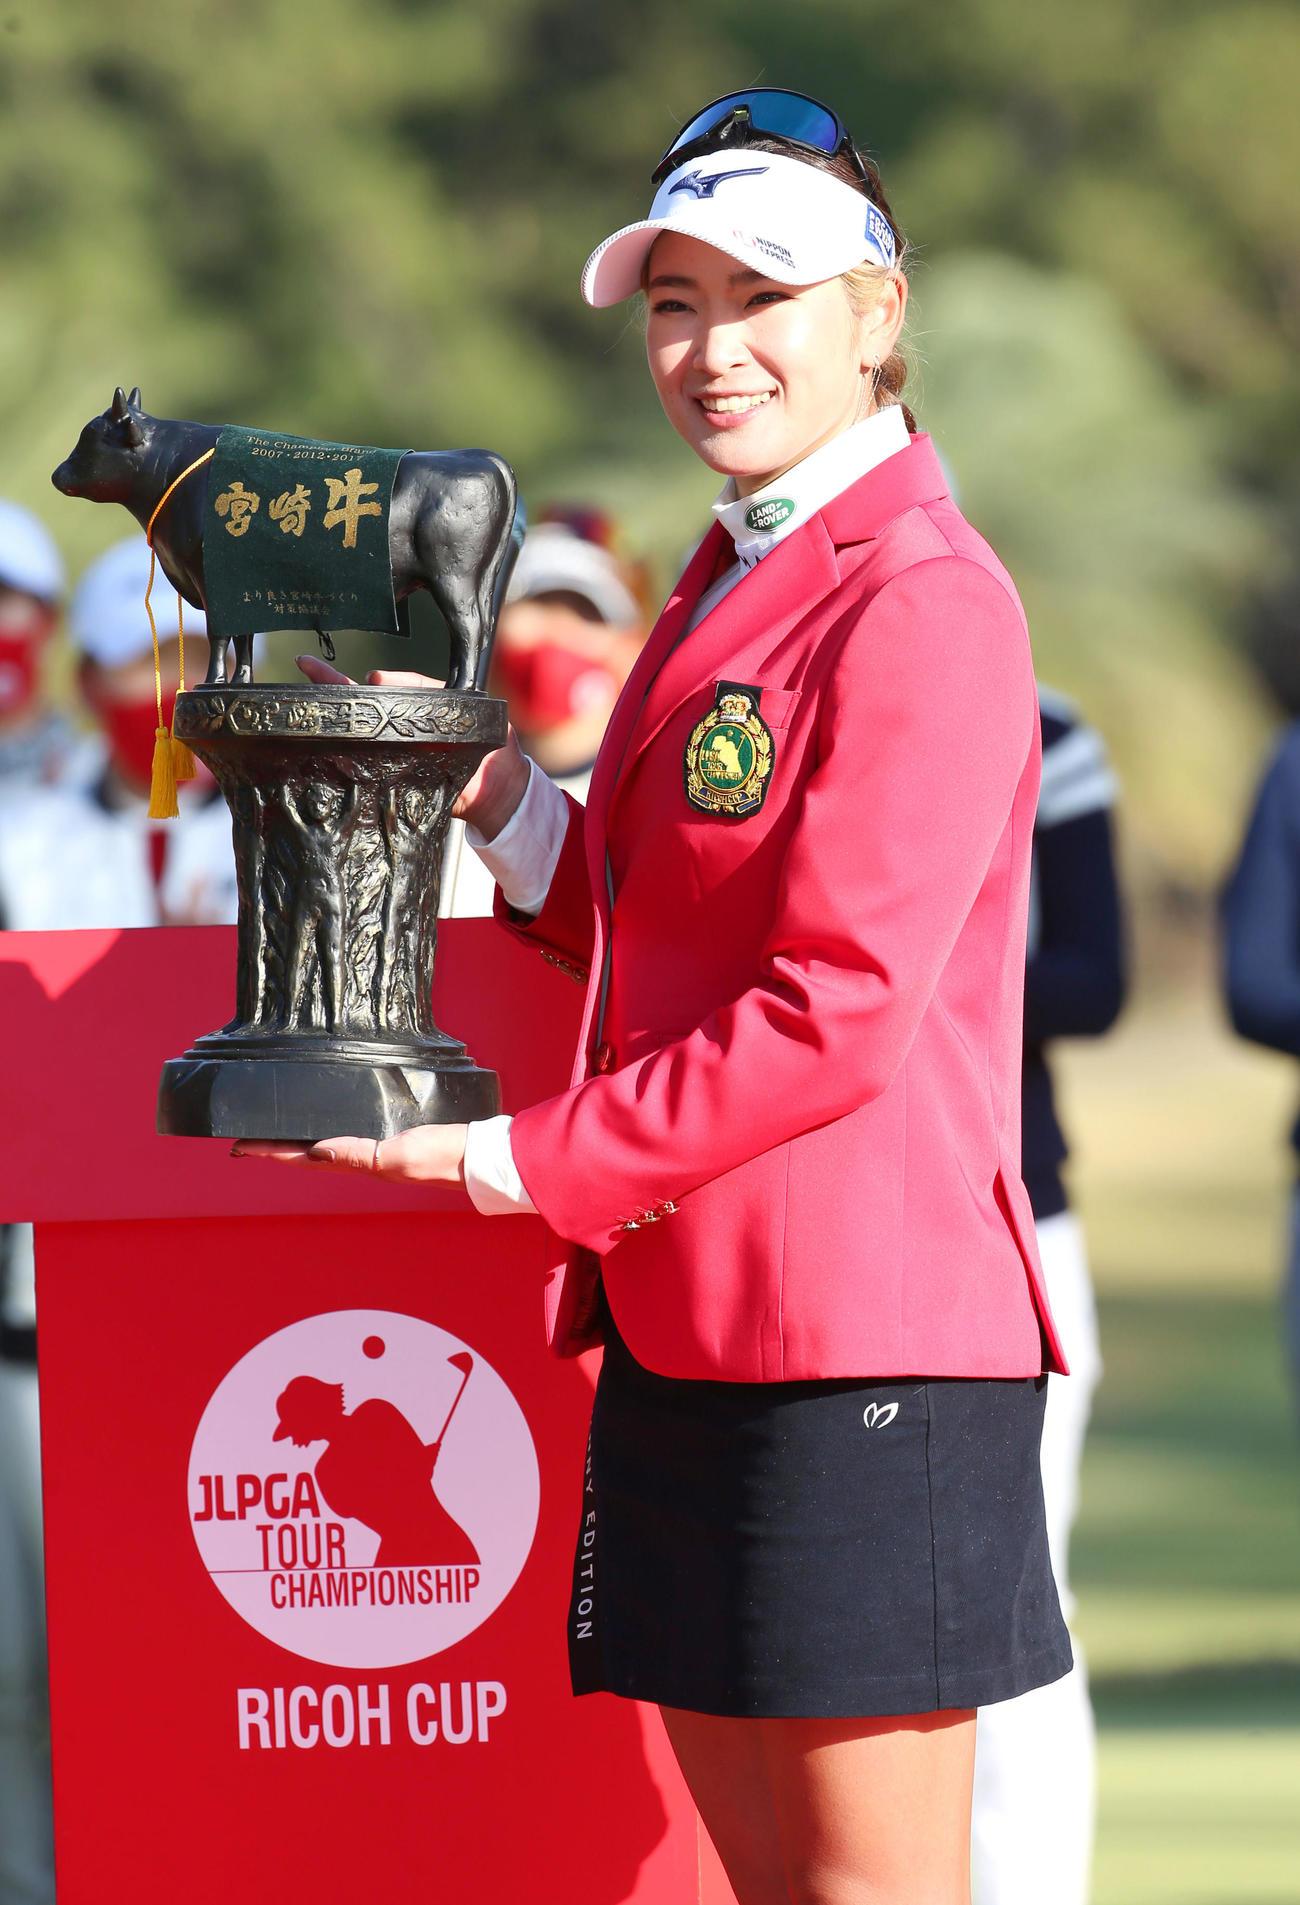 https://www.nikkansports.com/sports/golf/news/img/202011290000071-w1300_22.jpg